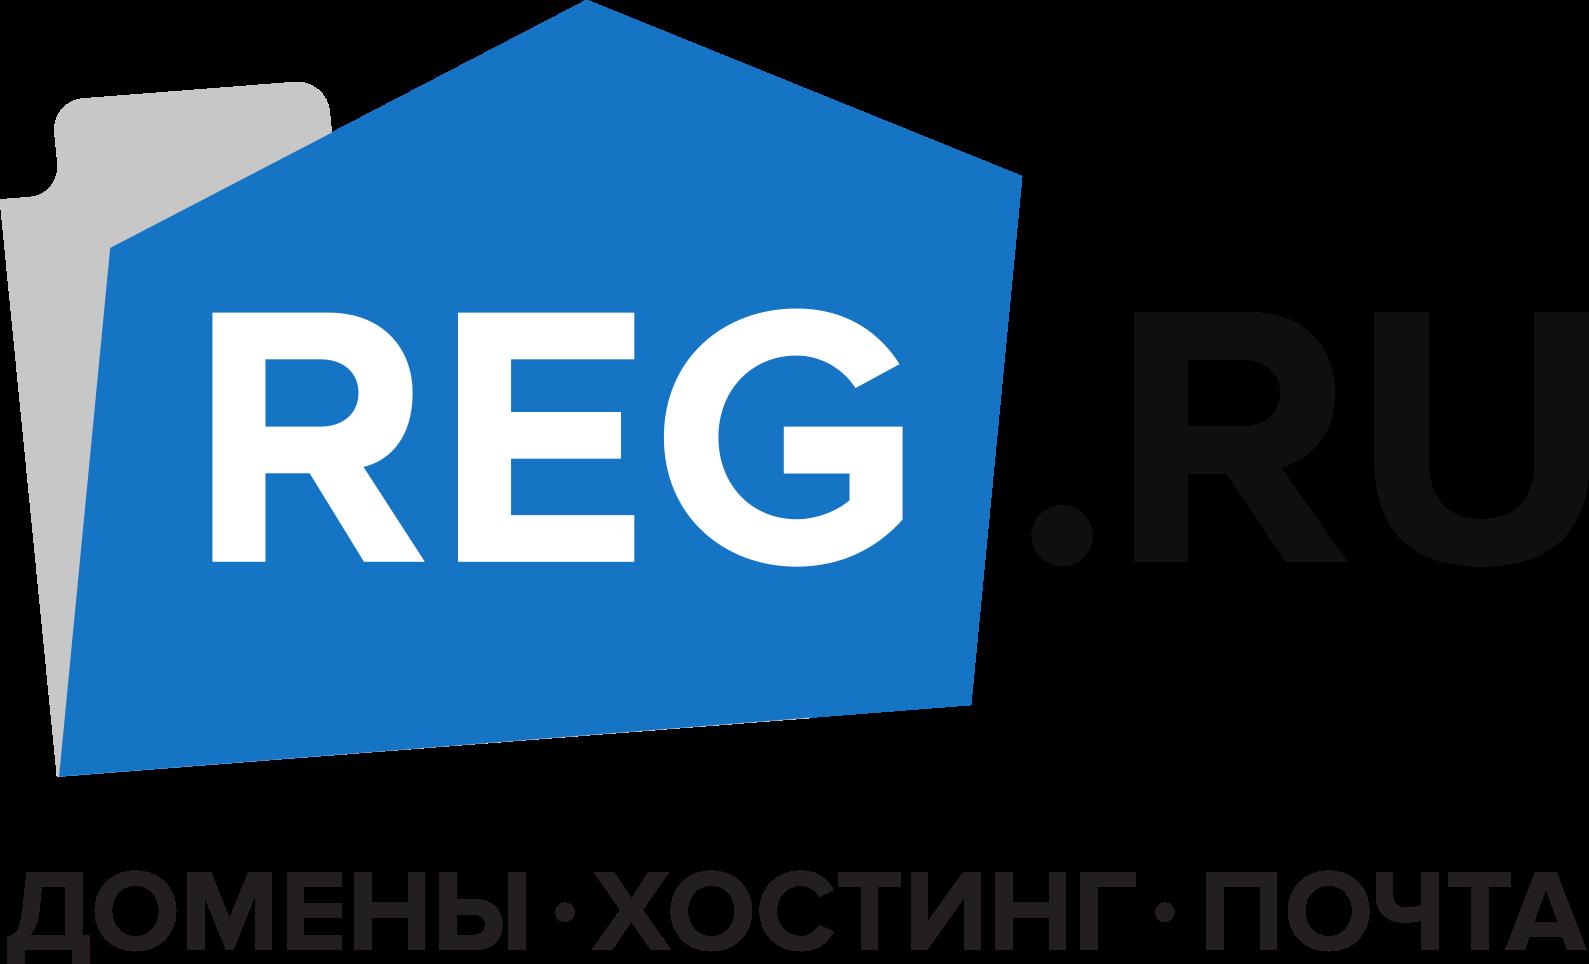 Рег.ру